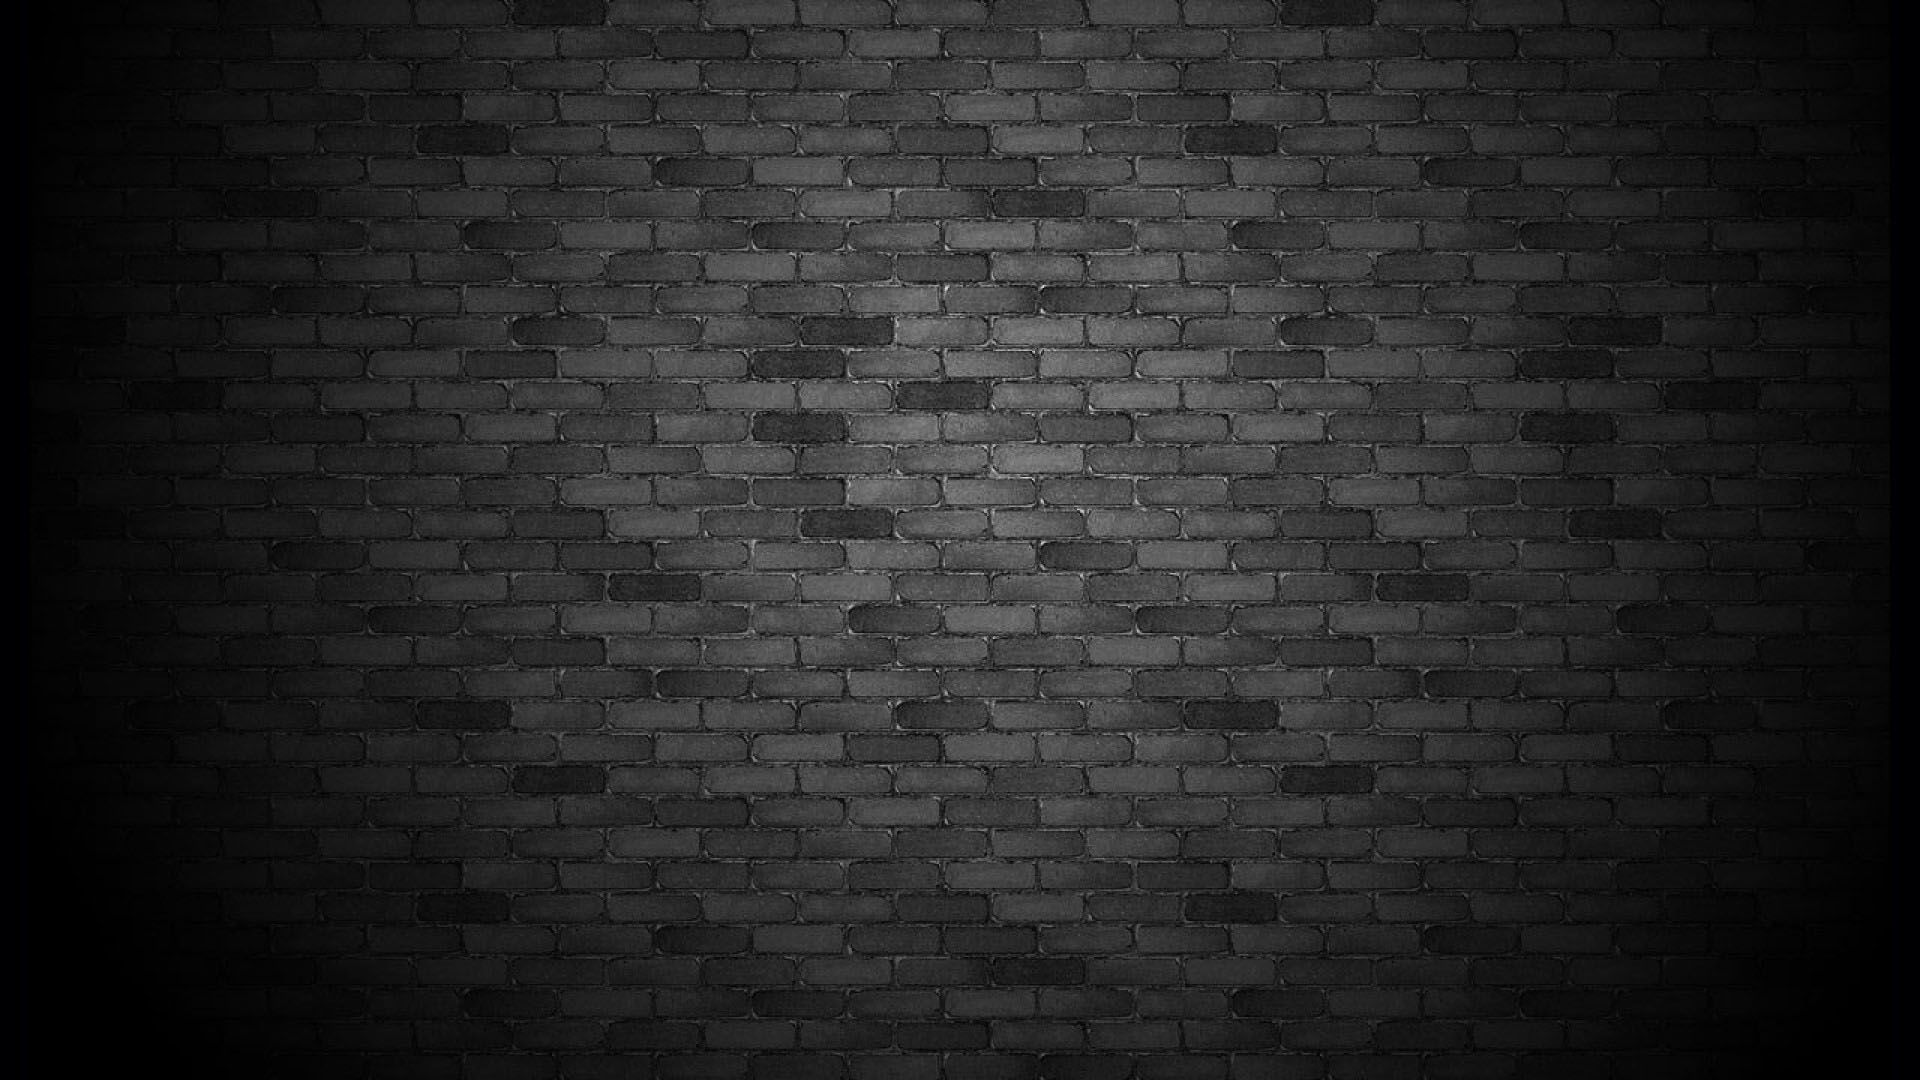 Black Brick Wall Background | Art in 2019 | Black brick wallpaper, Black brick, Brick wall wallpaper